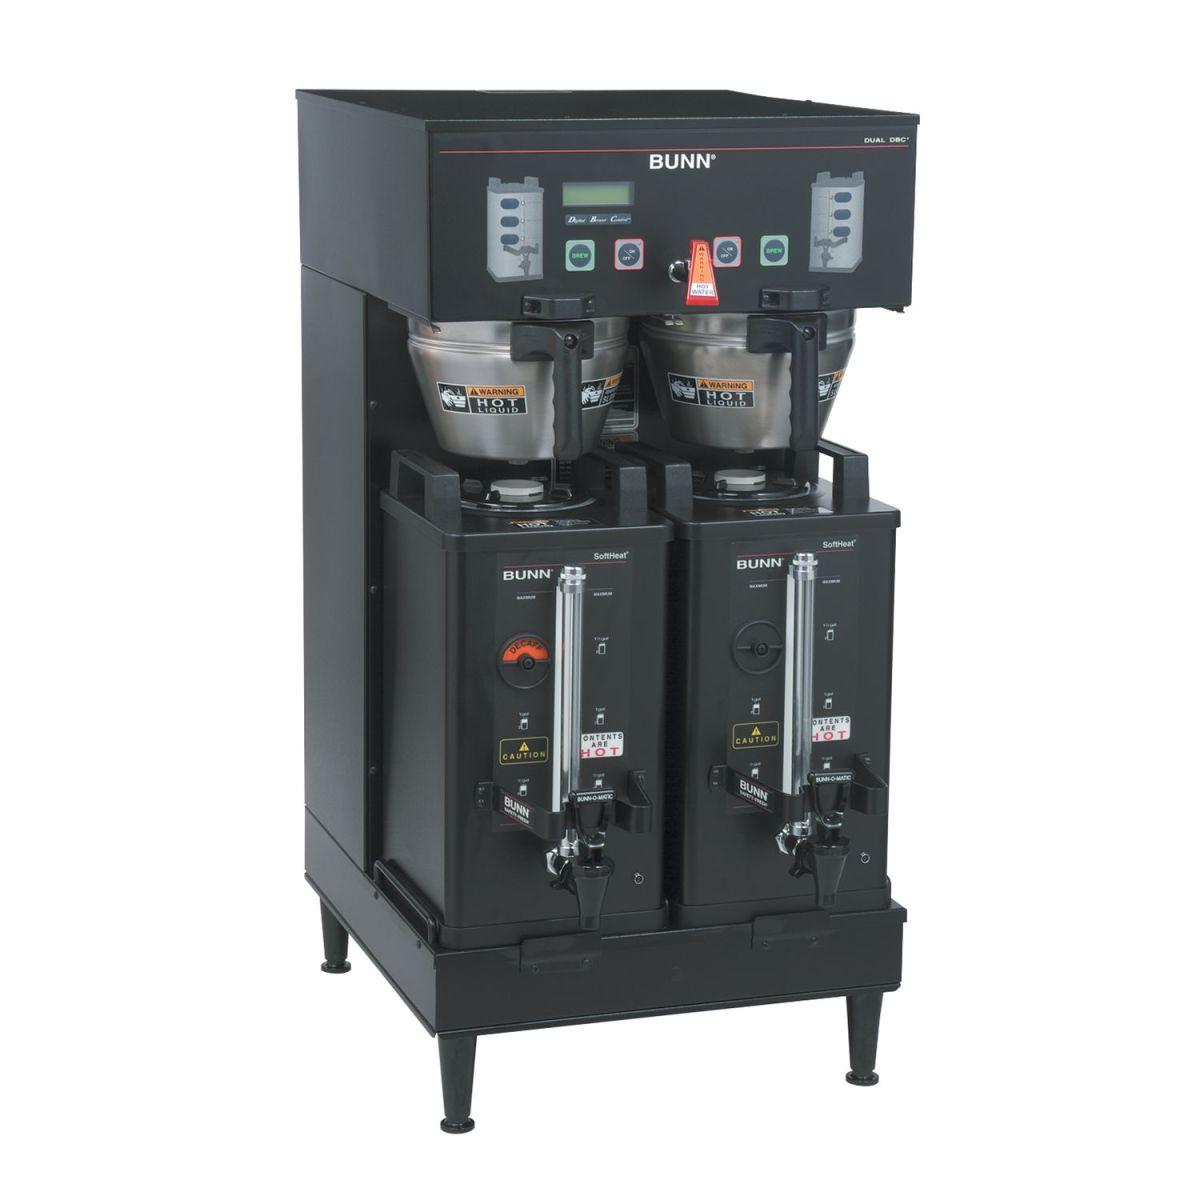 Bunn single gpr dbc owner s manual installation, operating, dv.